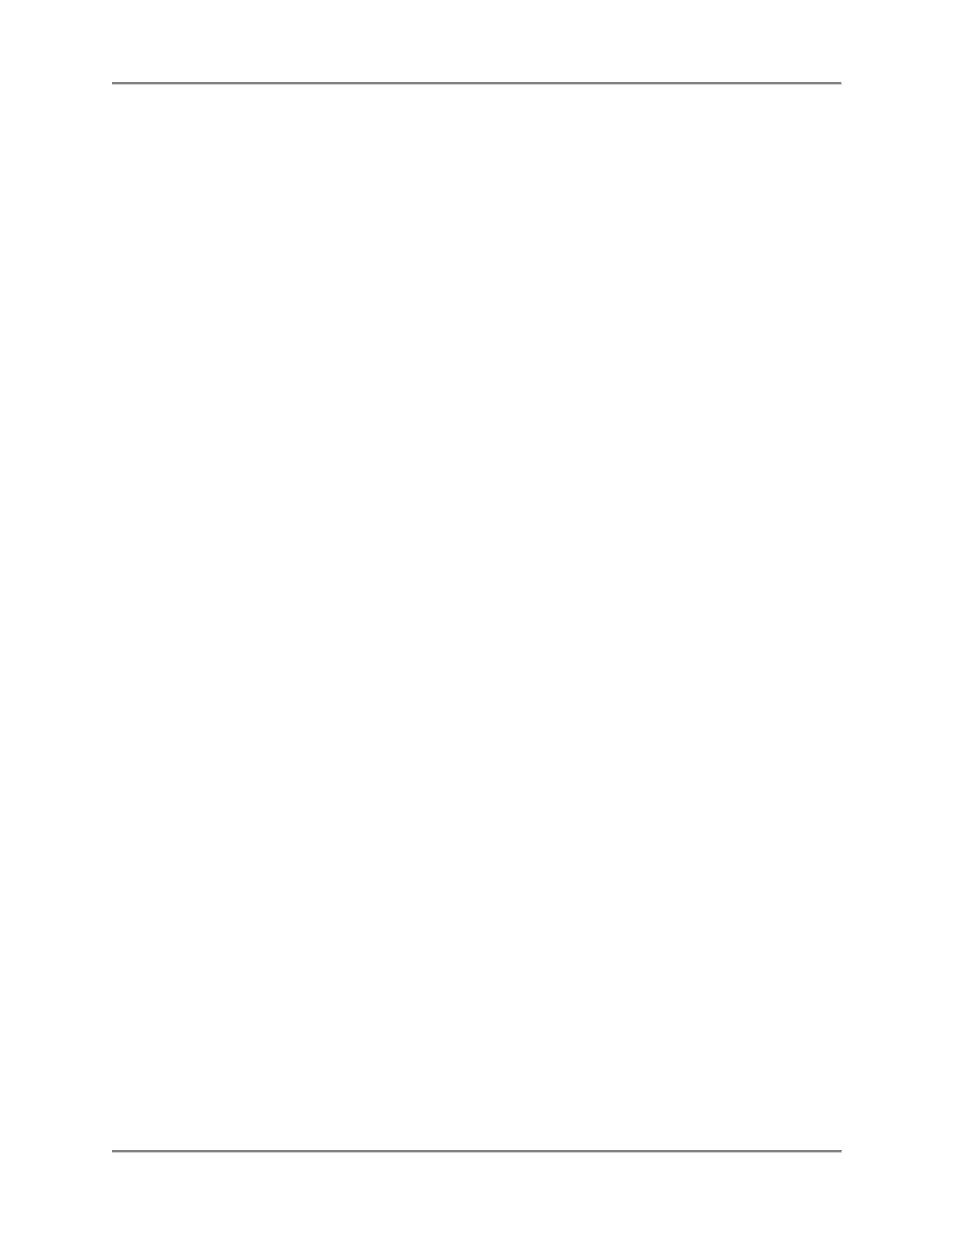 Temperature Adjustment Operational Guidelines Unit Shutdown Bki